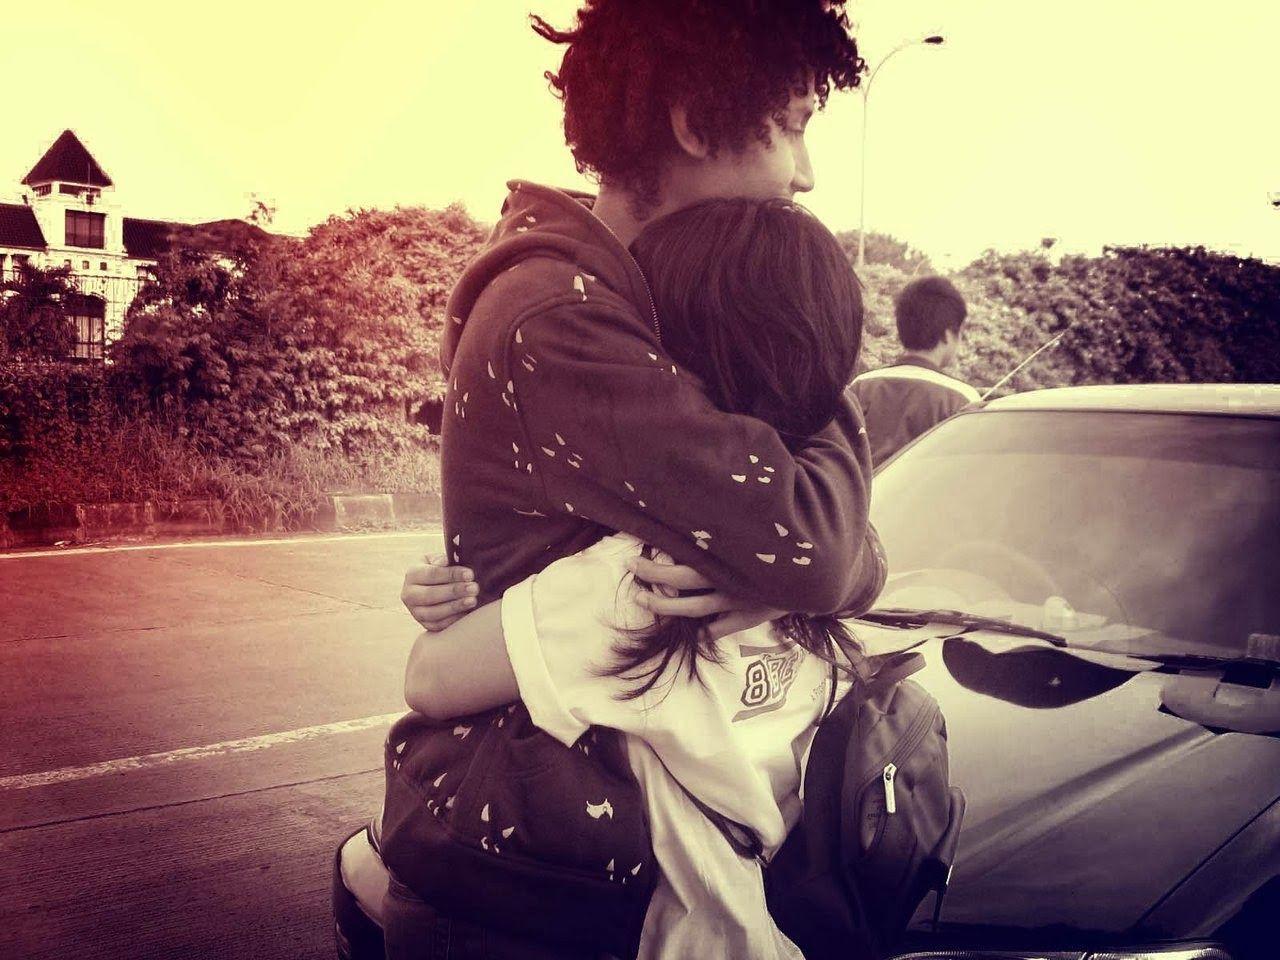 Cute Hugging Couples Wallpapers Lovers Hug Wallpapers Wallpaper Cave